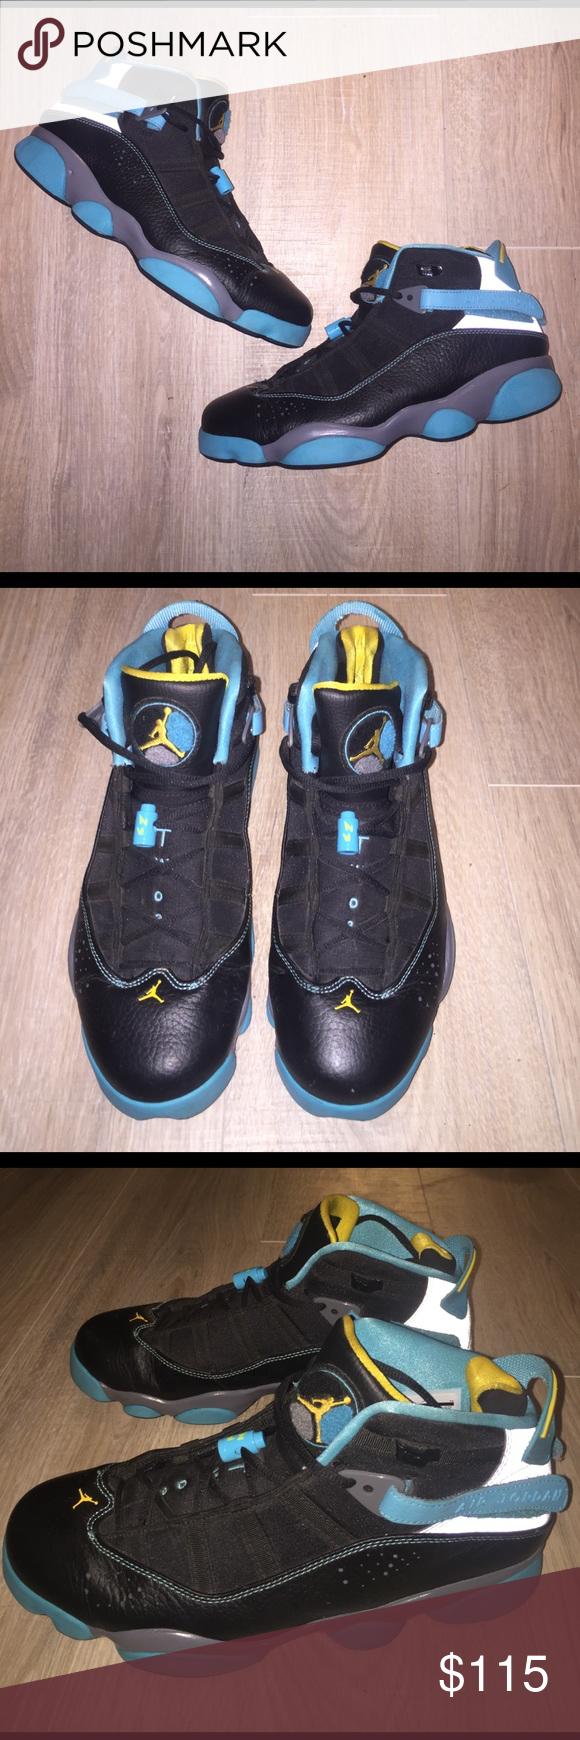 Air Jordan 6 Rings Air Jordan 6 Rings